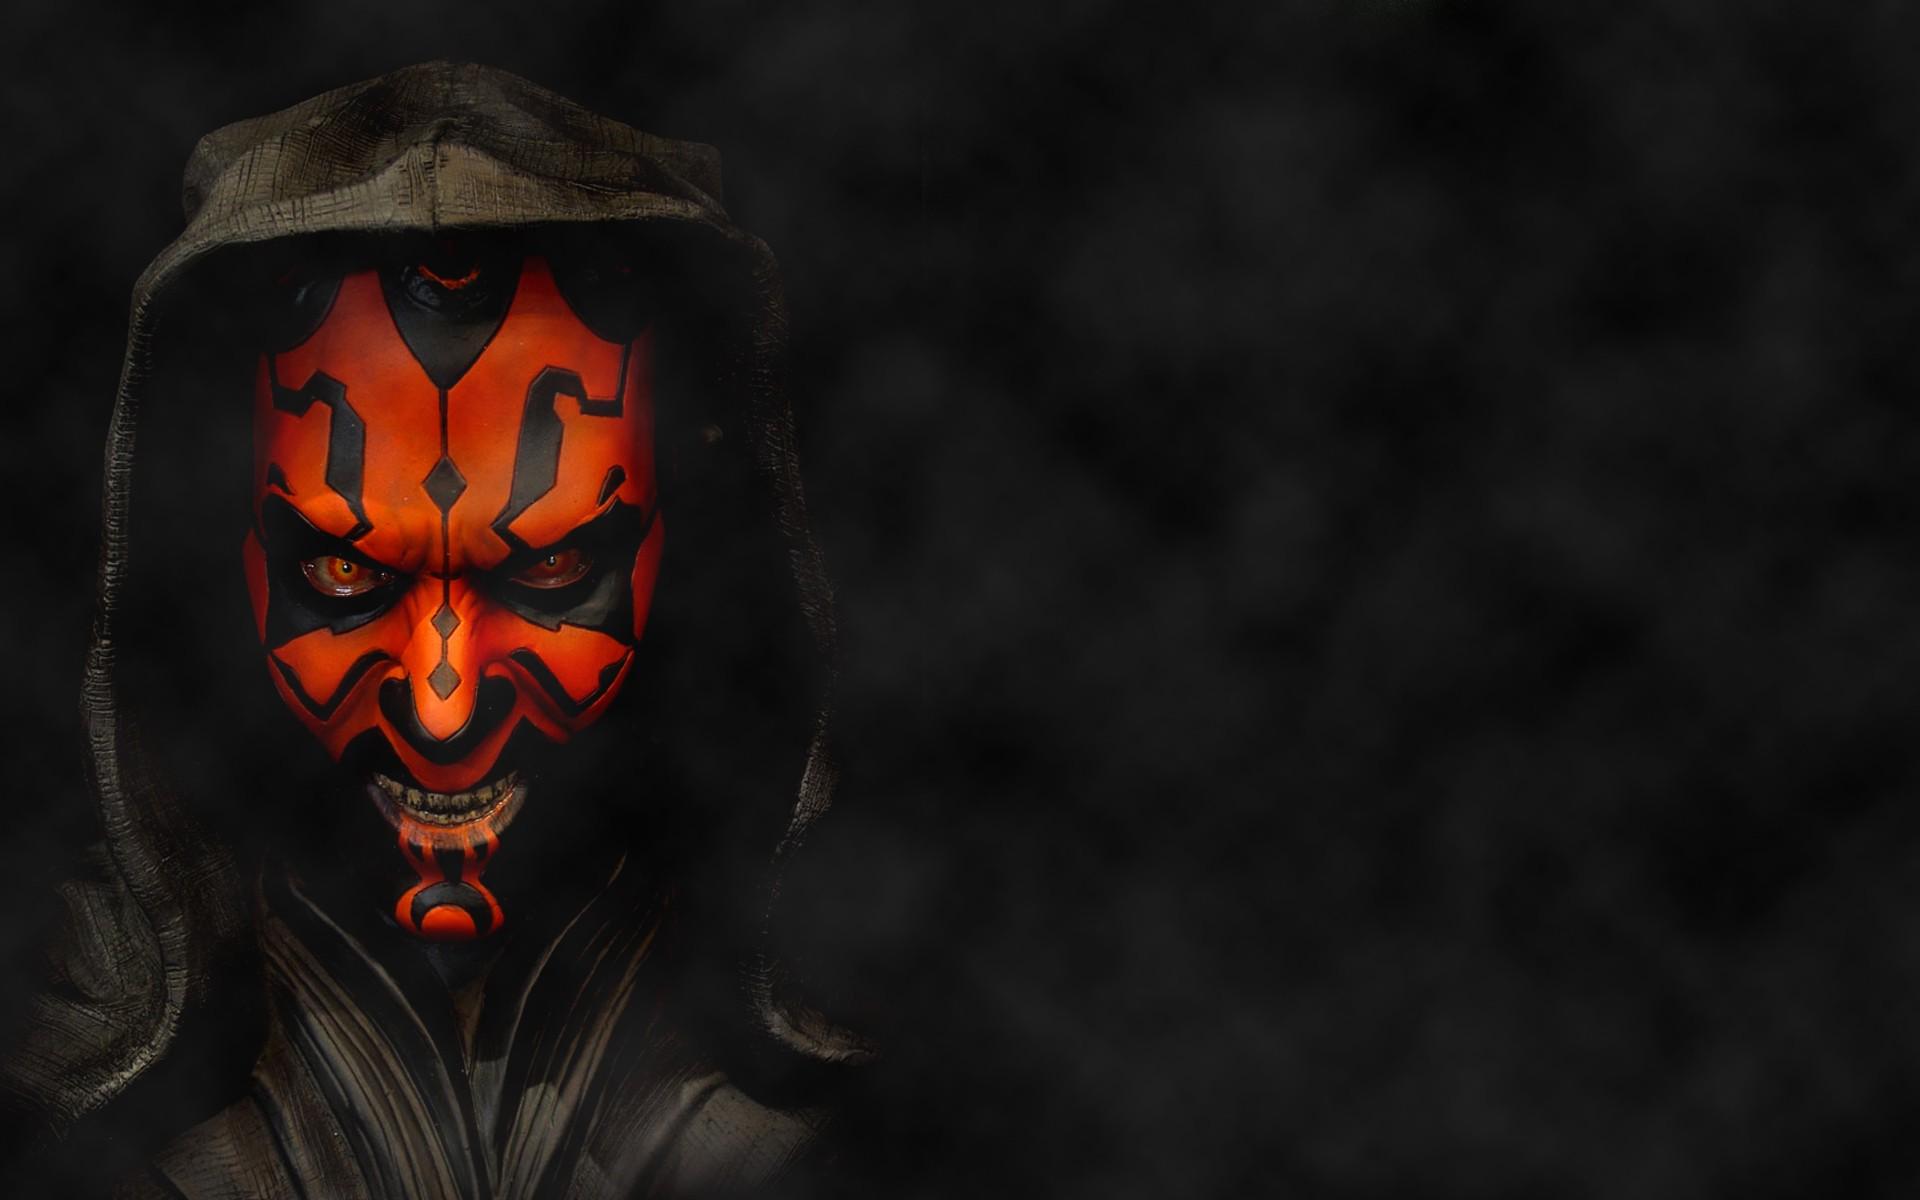 Best Wallpaper Halloween Star Wars - Star-Wars-Halloween-Darth-Maul-darkness-1920x1200-px-computer-wallpaper-fictional-character-786889  Trends_312933.jpg